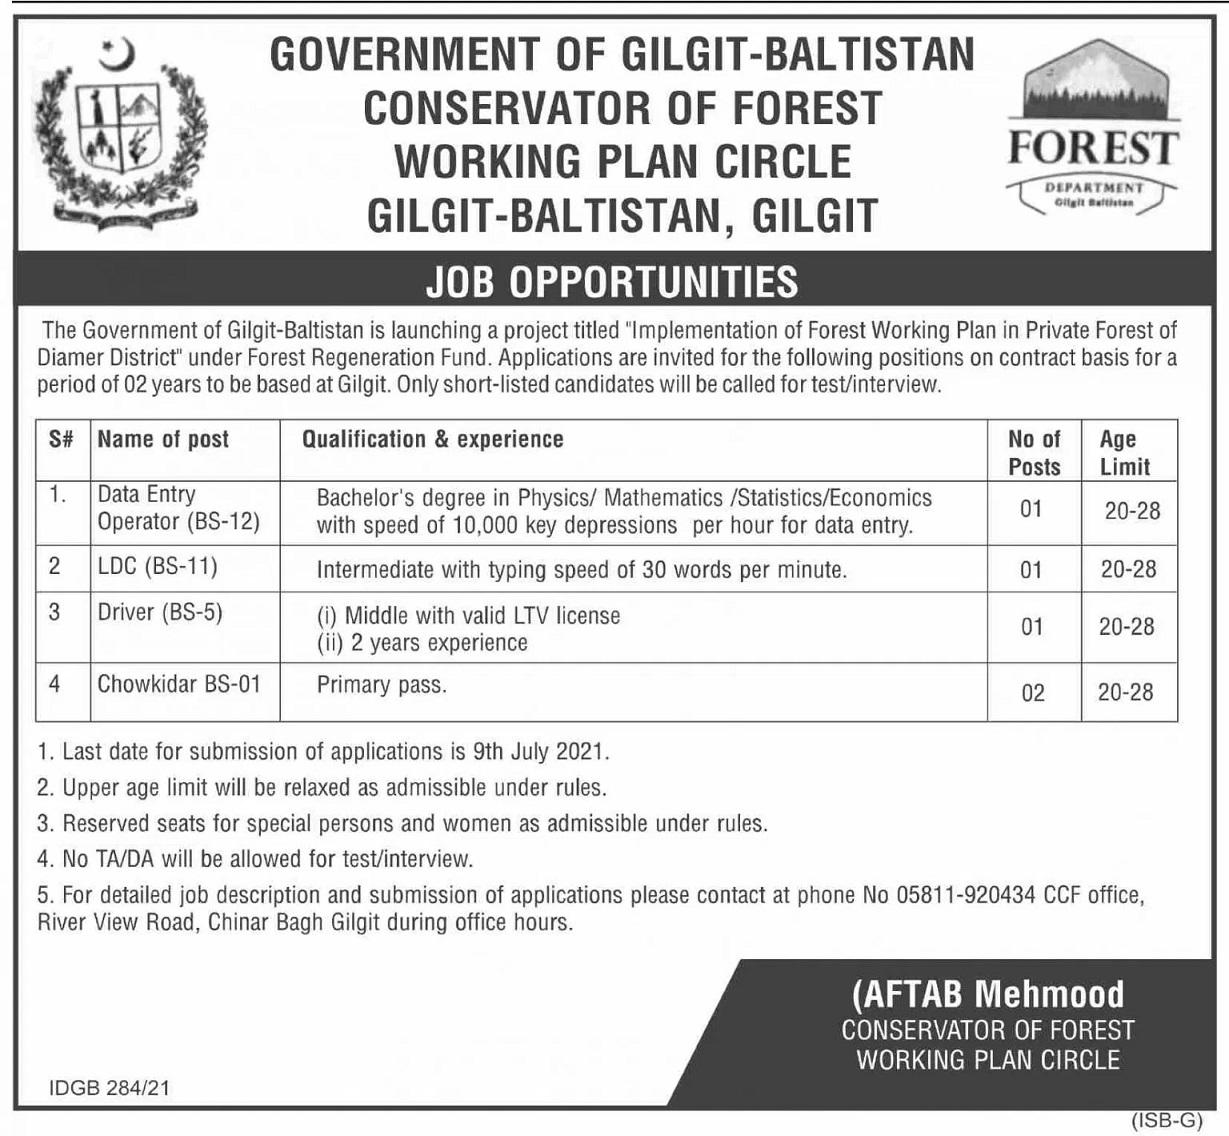 Forest Department Gilgit Baltistan Jobs Today Govt Jobs Gilgit Baltistan 2021